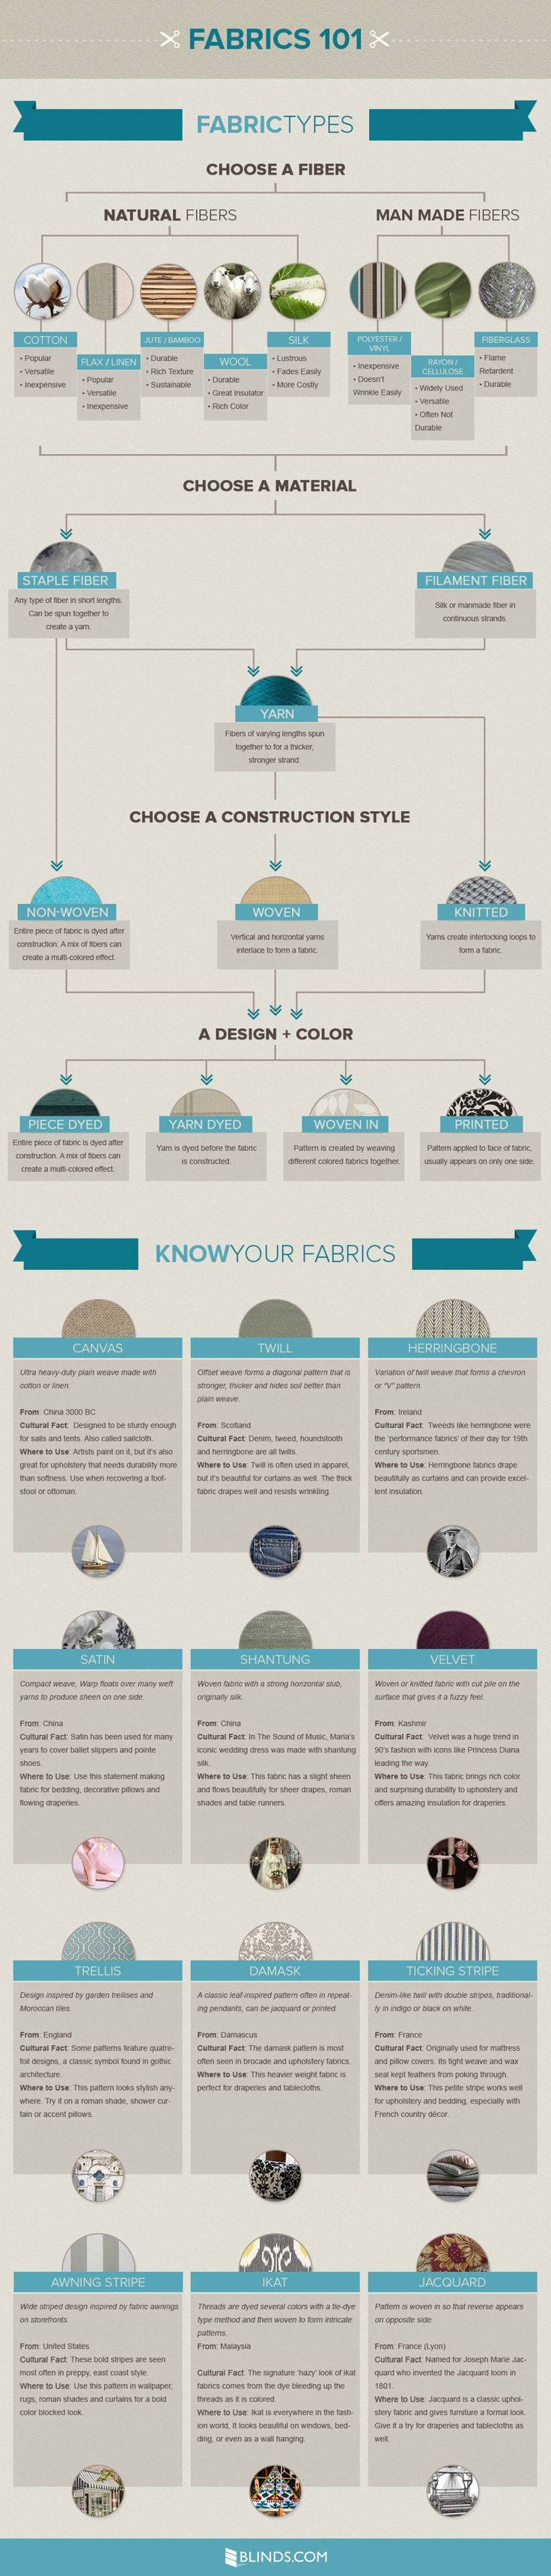 Fabrics 101: Textiles, Fibers + Home Décor Infographic